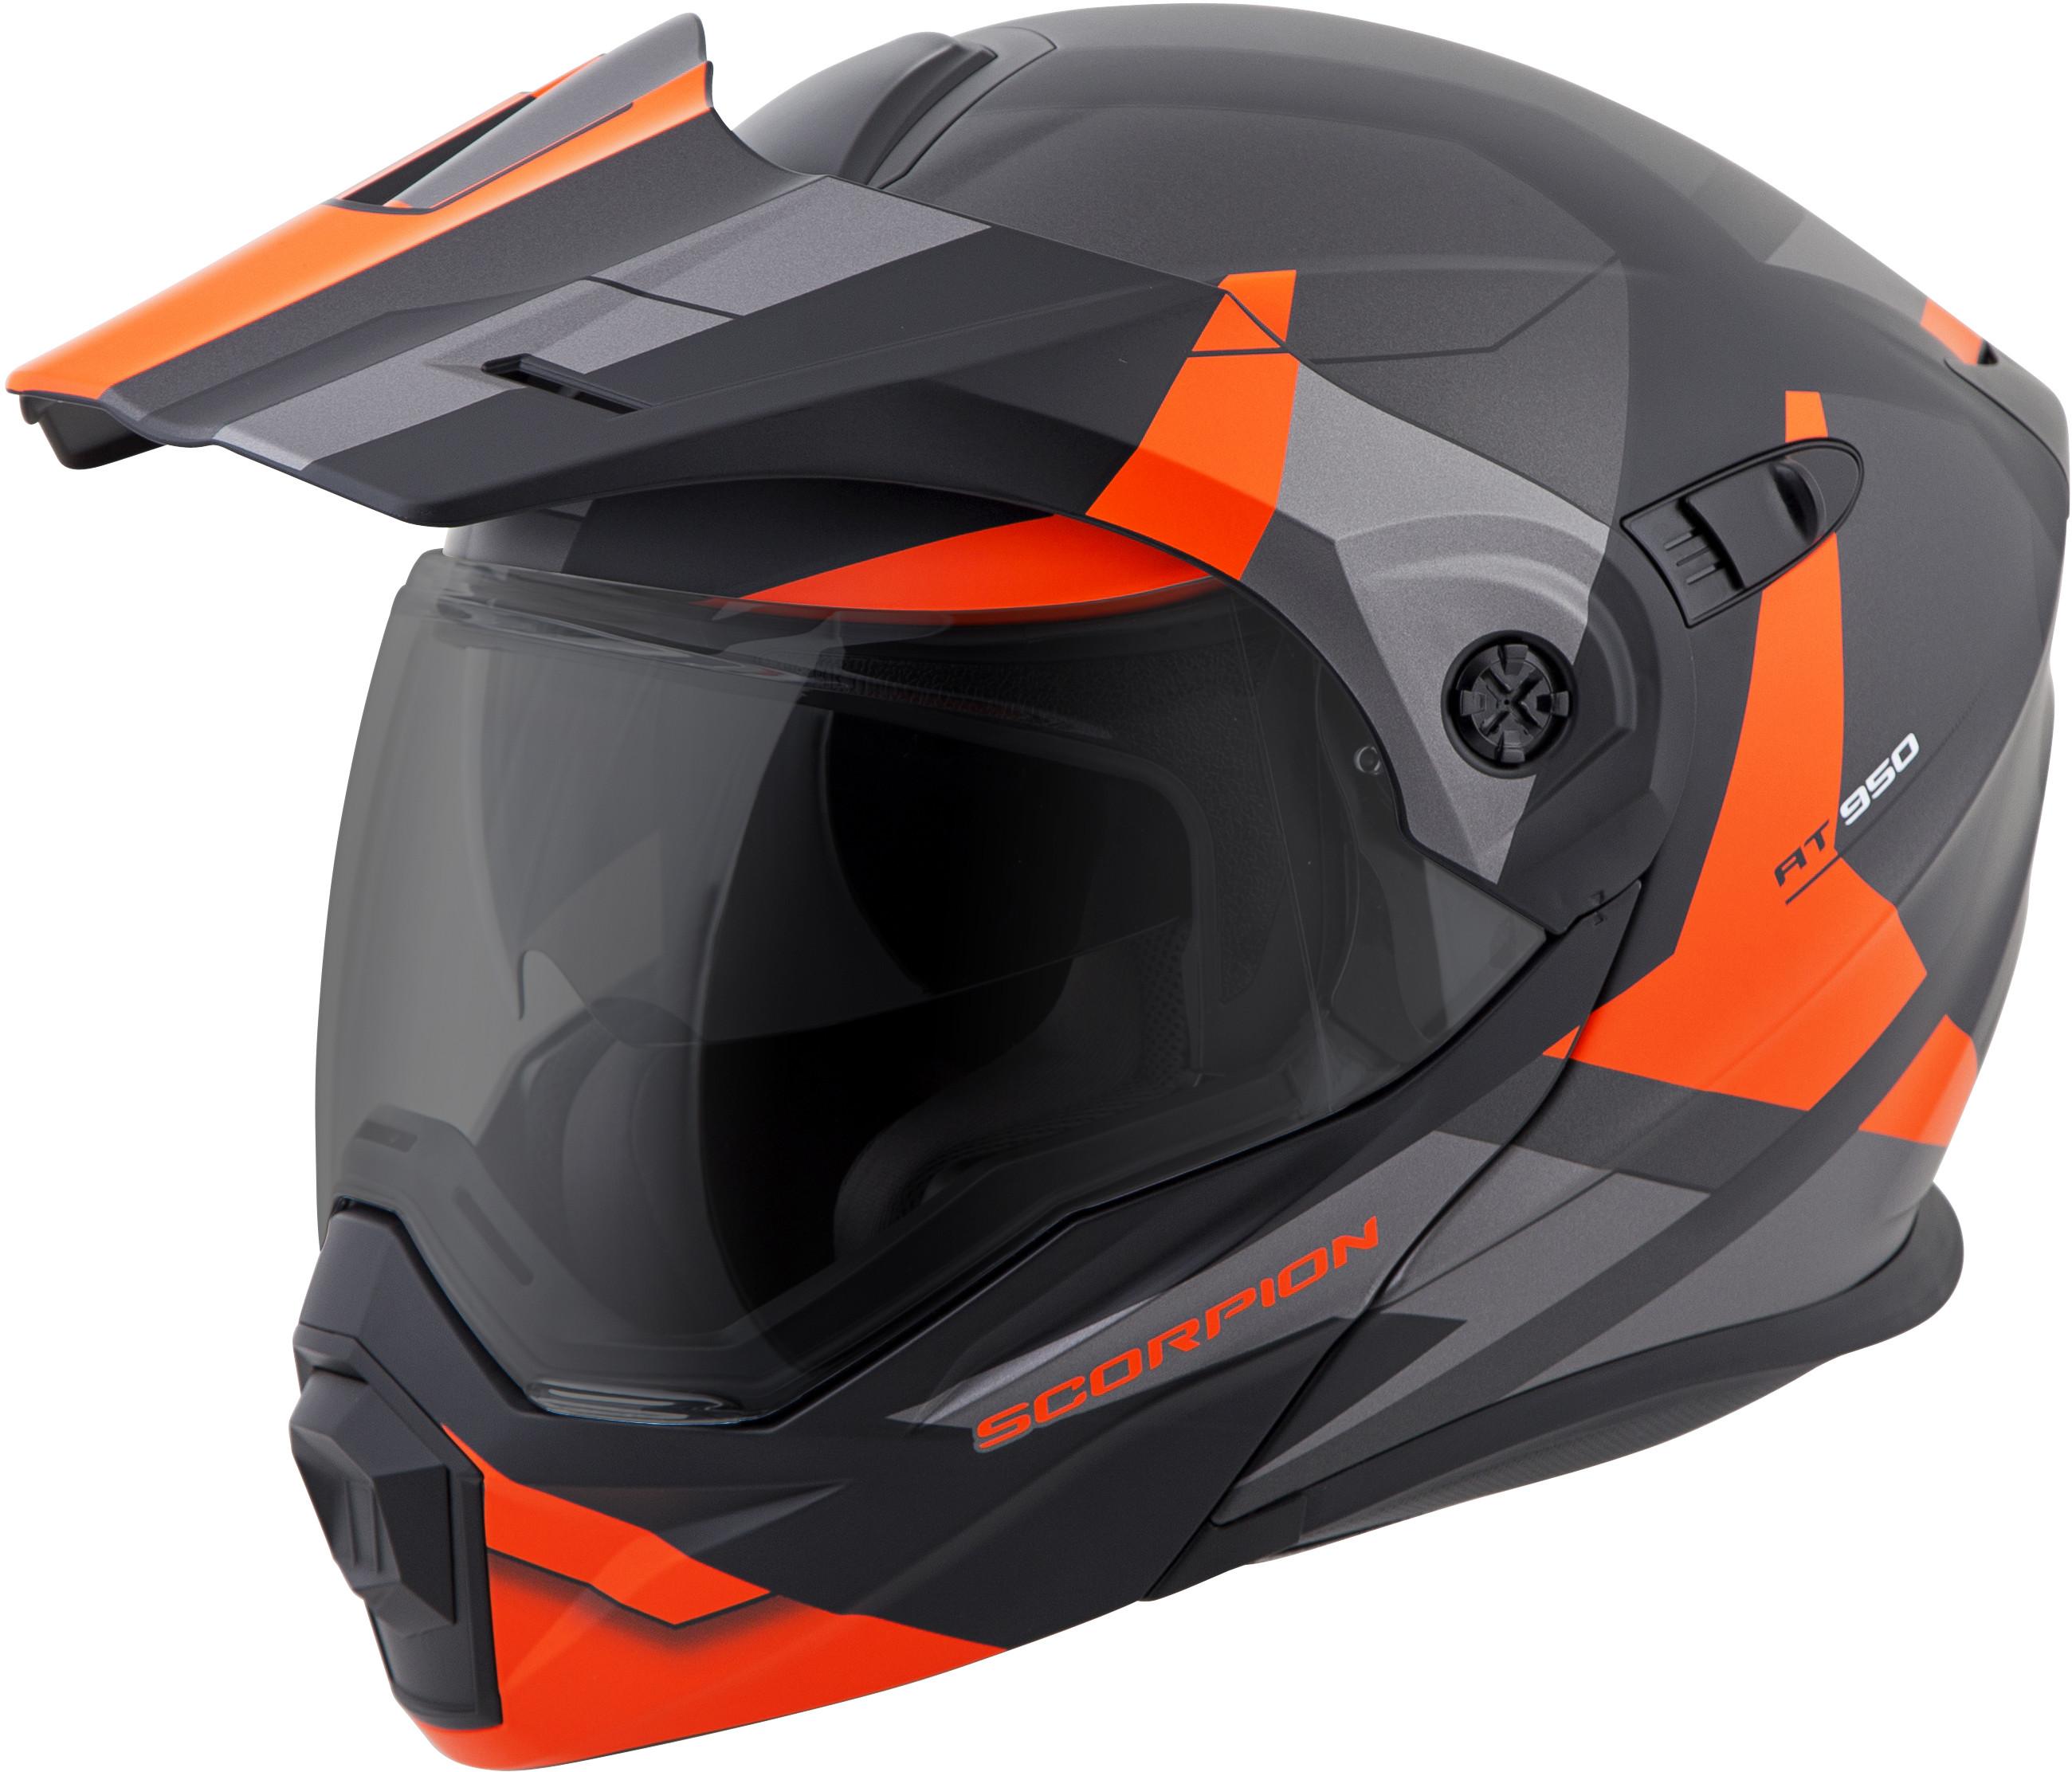 for-Scorpion-Helmet-EXO-AT950-Neocon-Snow-Helmet-with-Dual-Lens-Shield miniature 16